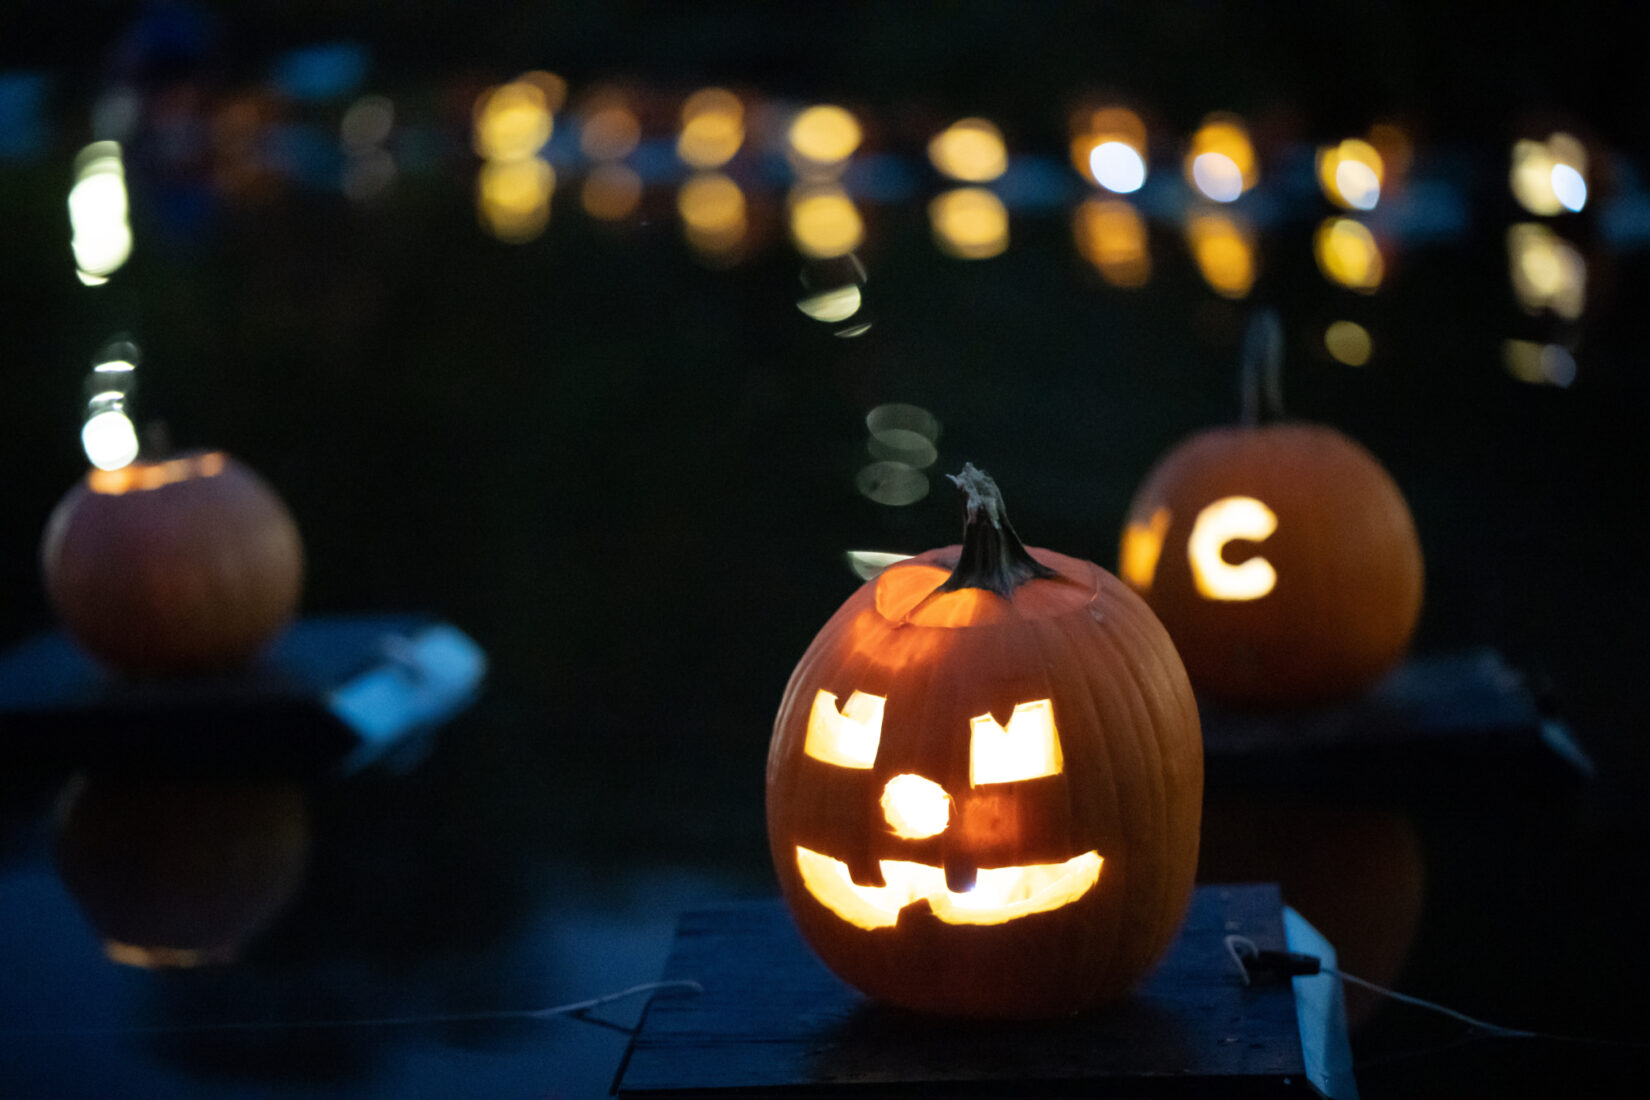 Halloween Pumpkin Flotilla 20191030 06822